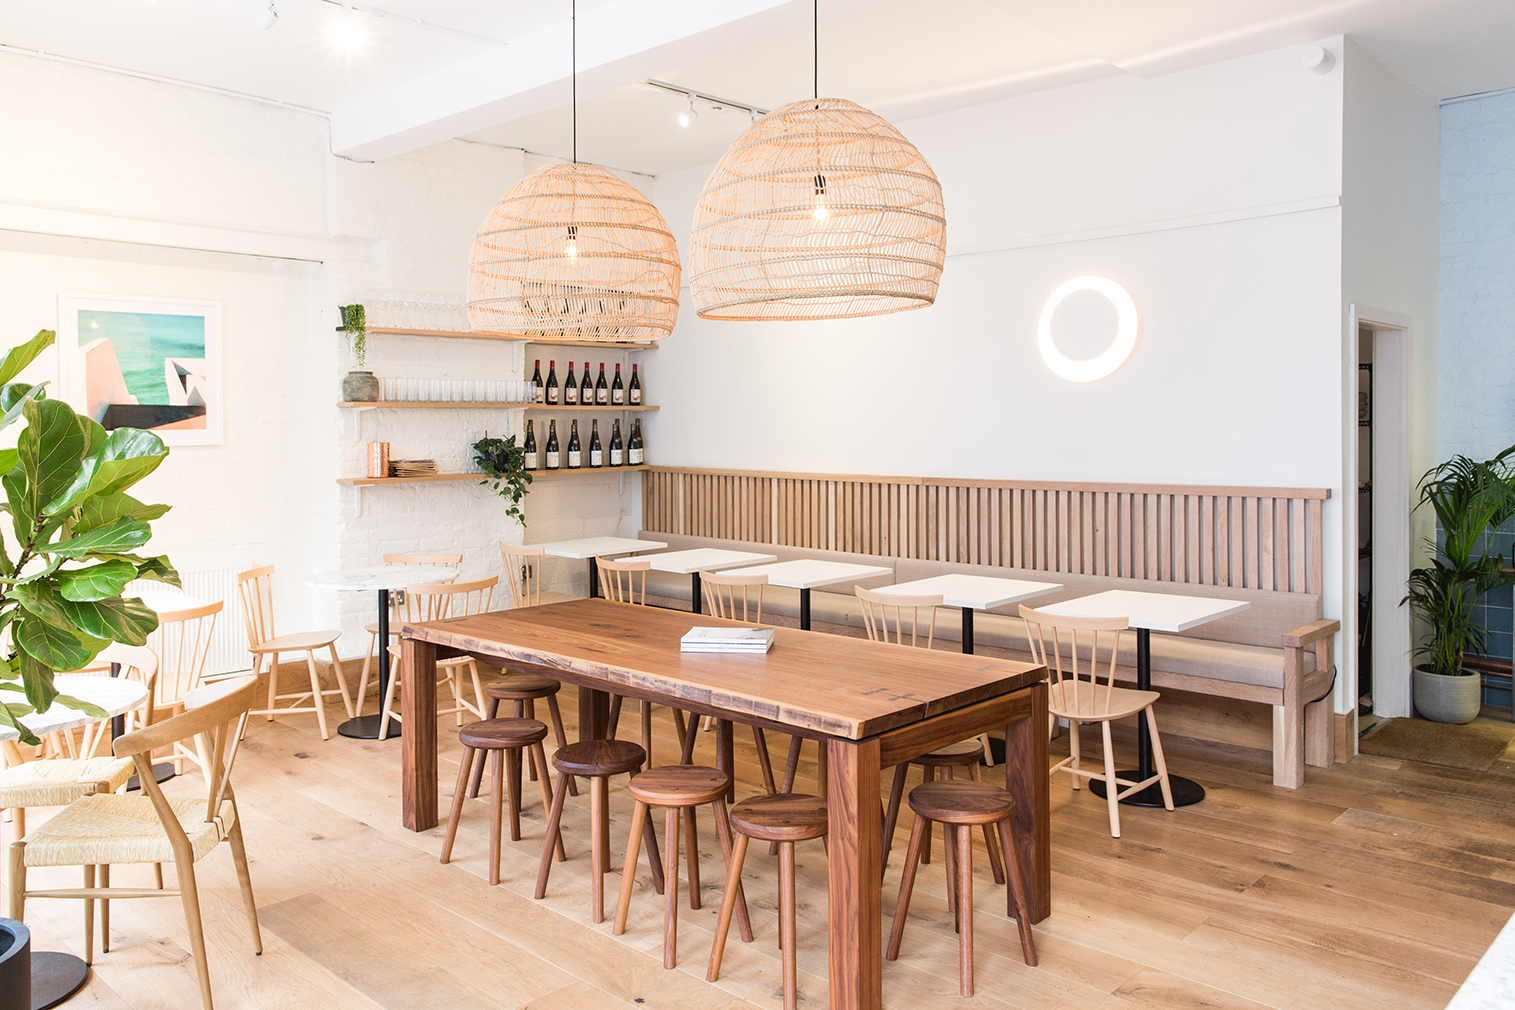 New London restaurants to visit this autumn -- Milk Beach